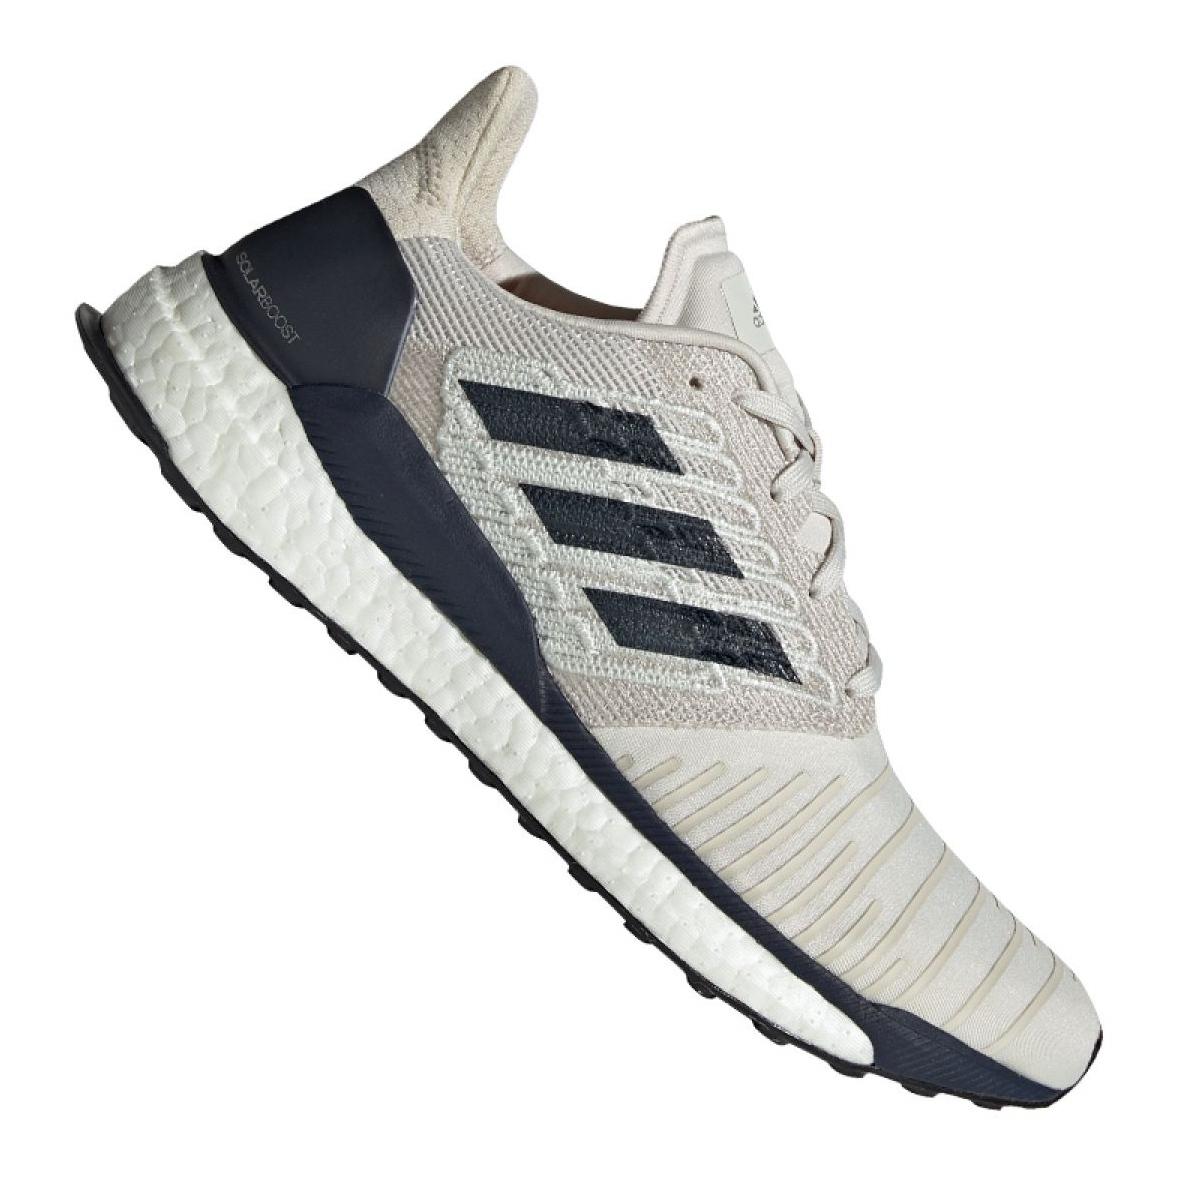 Solar Adidas Boost M Chaussures D97435 WIE9DH2